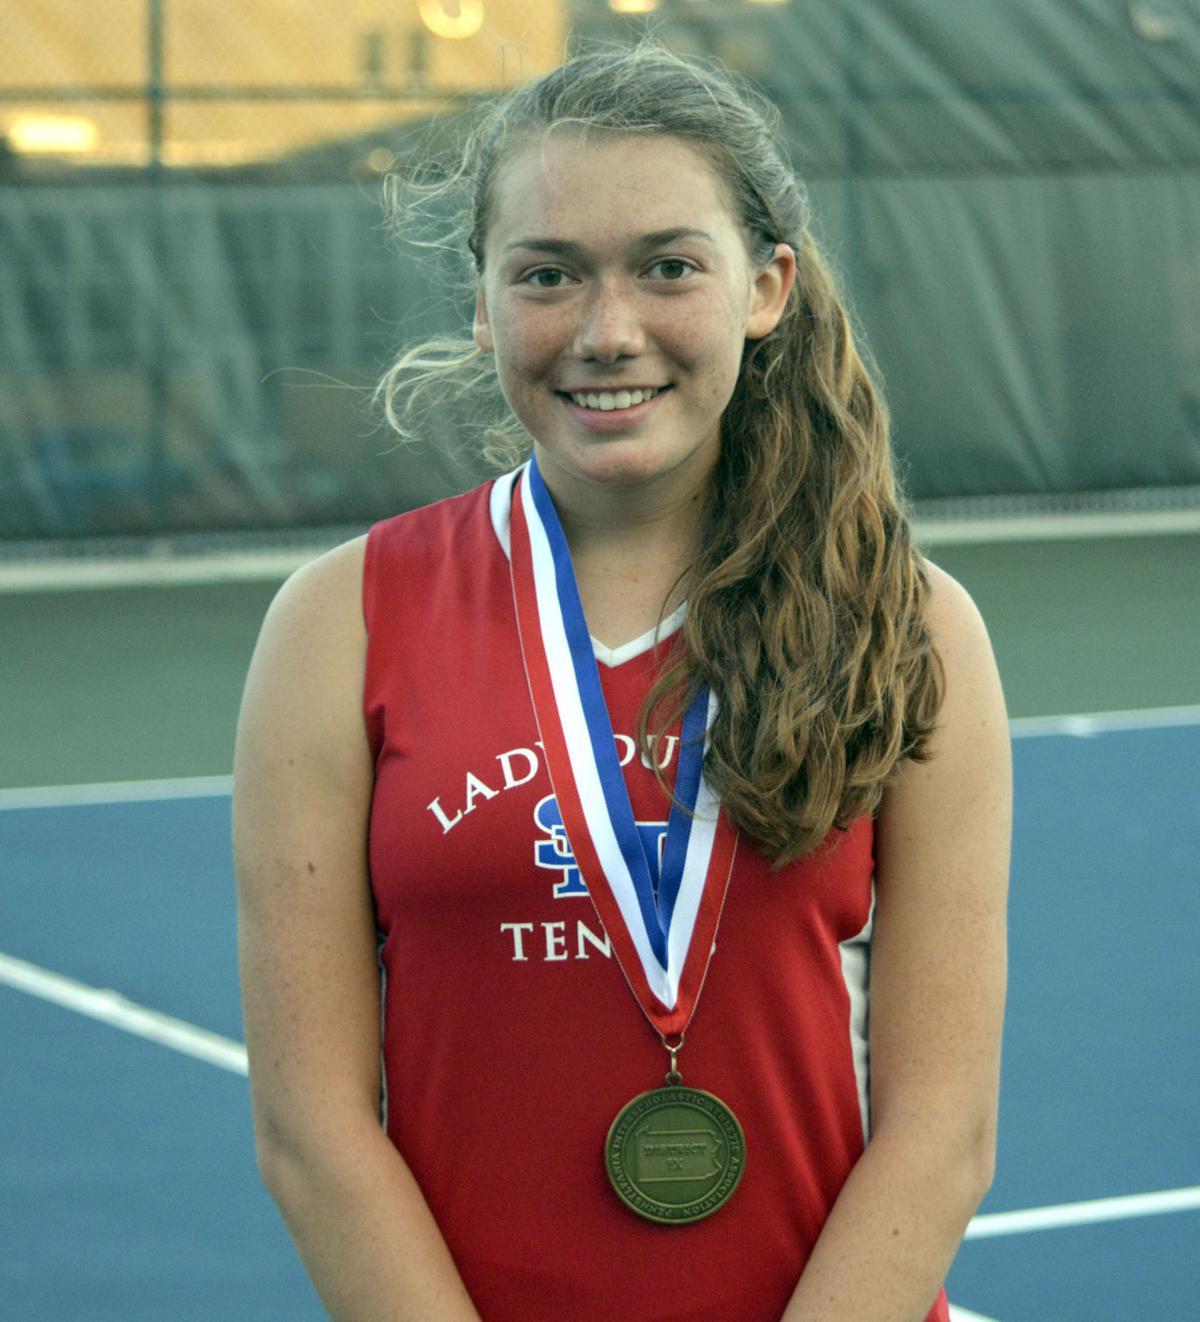 20161005-ce-sp Casey medal